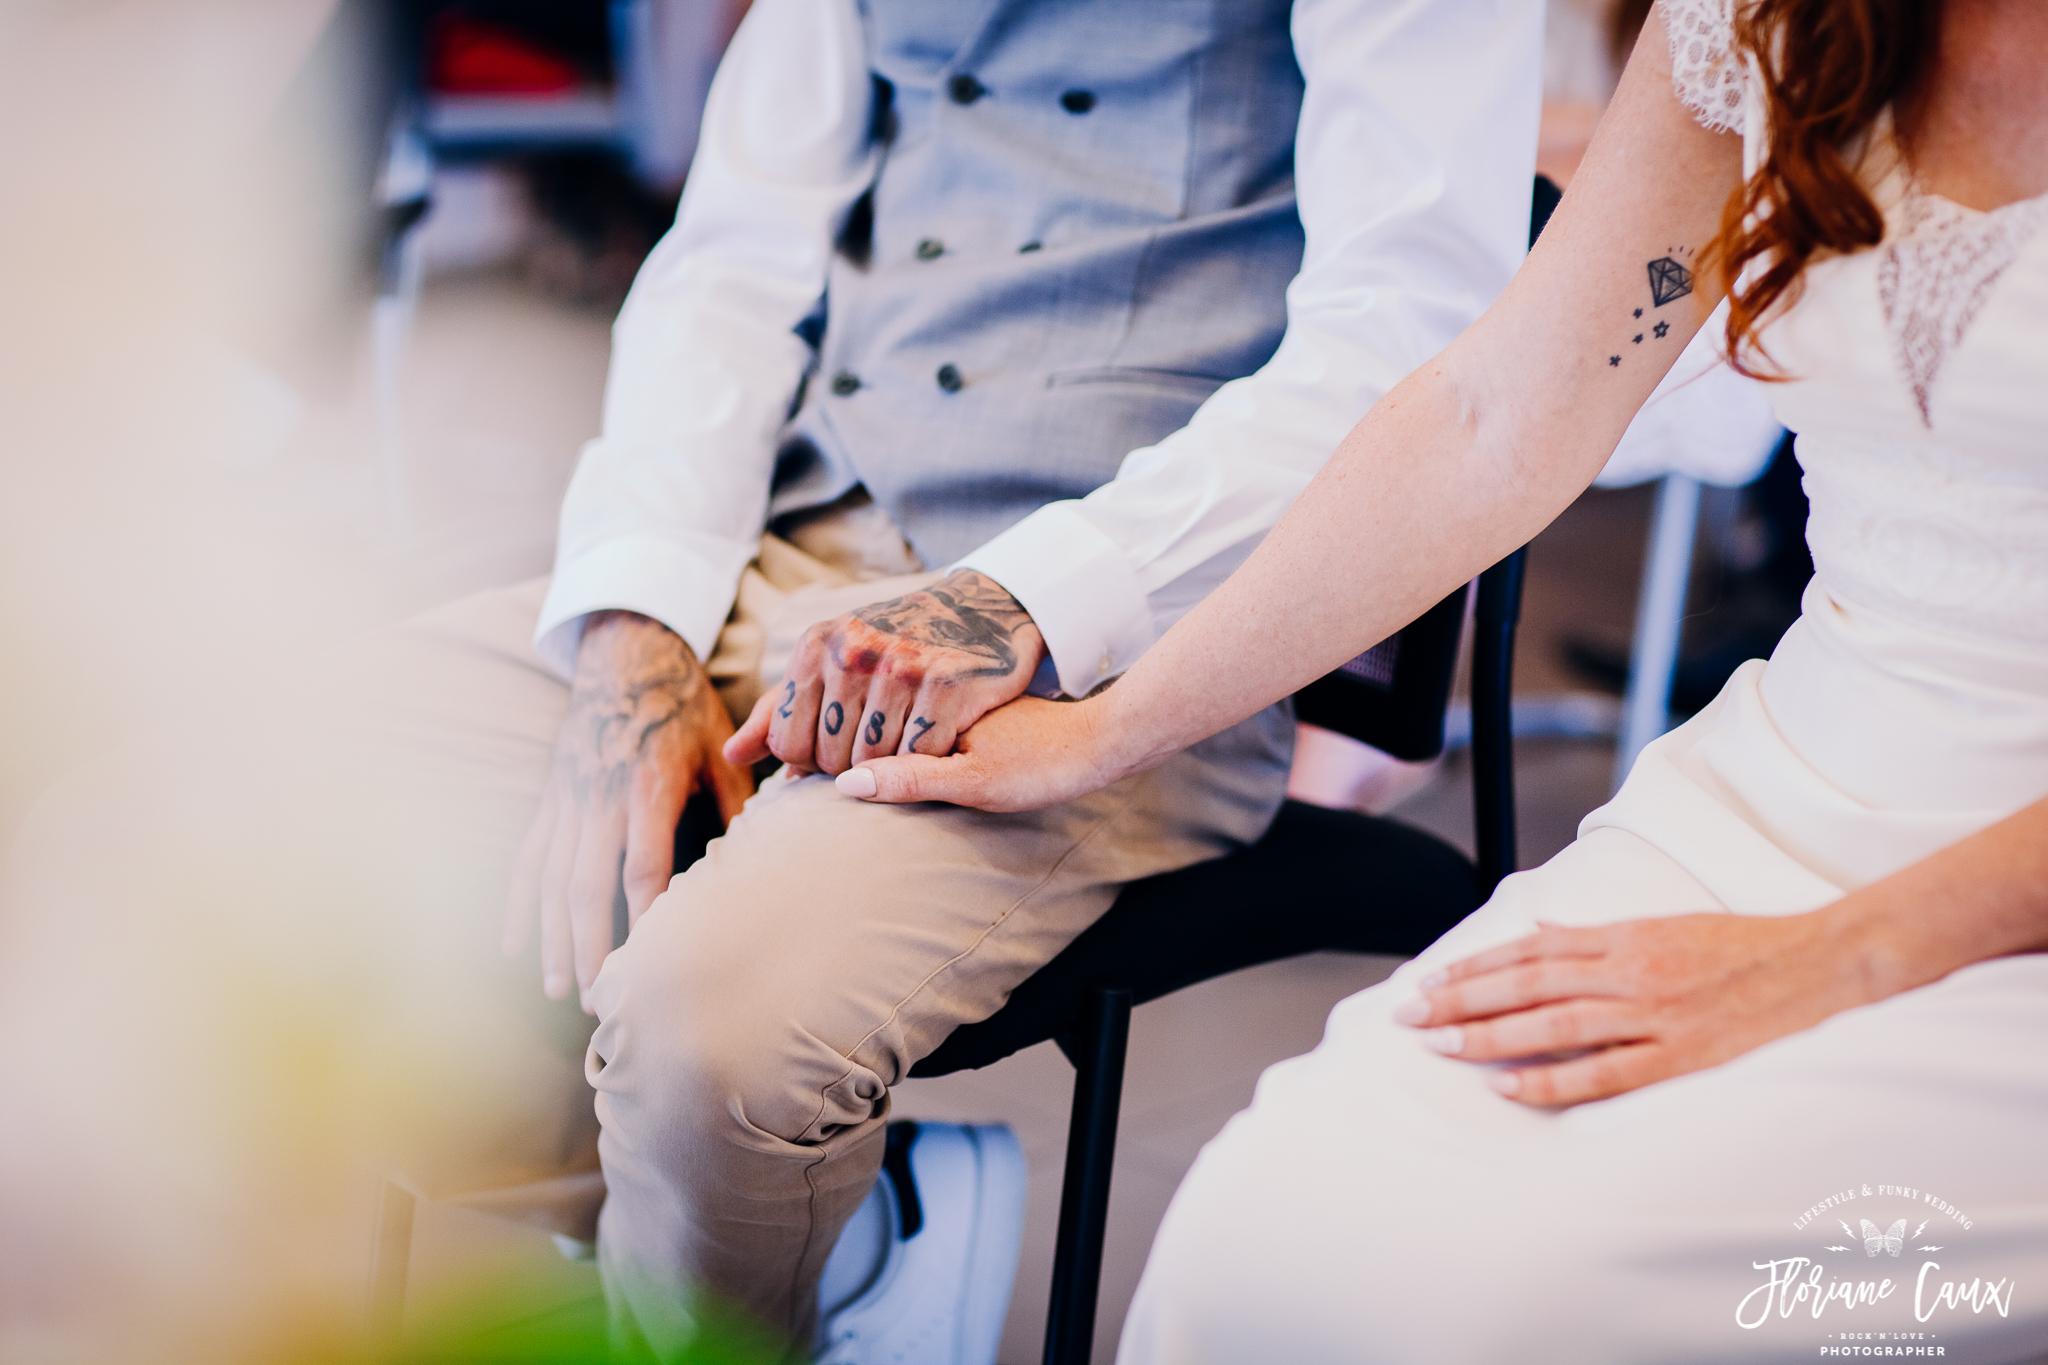 photographe-mariage-toulouse-rocknroll-maries-tatoues-floriane-caux-31